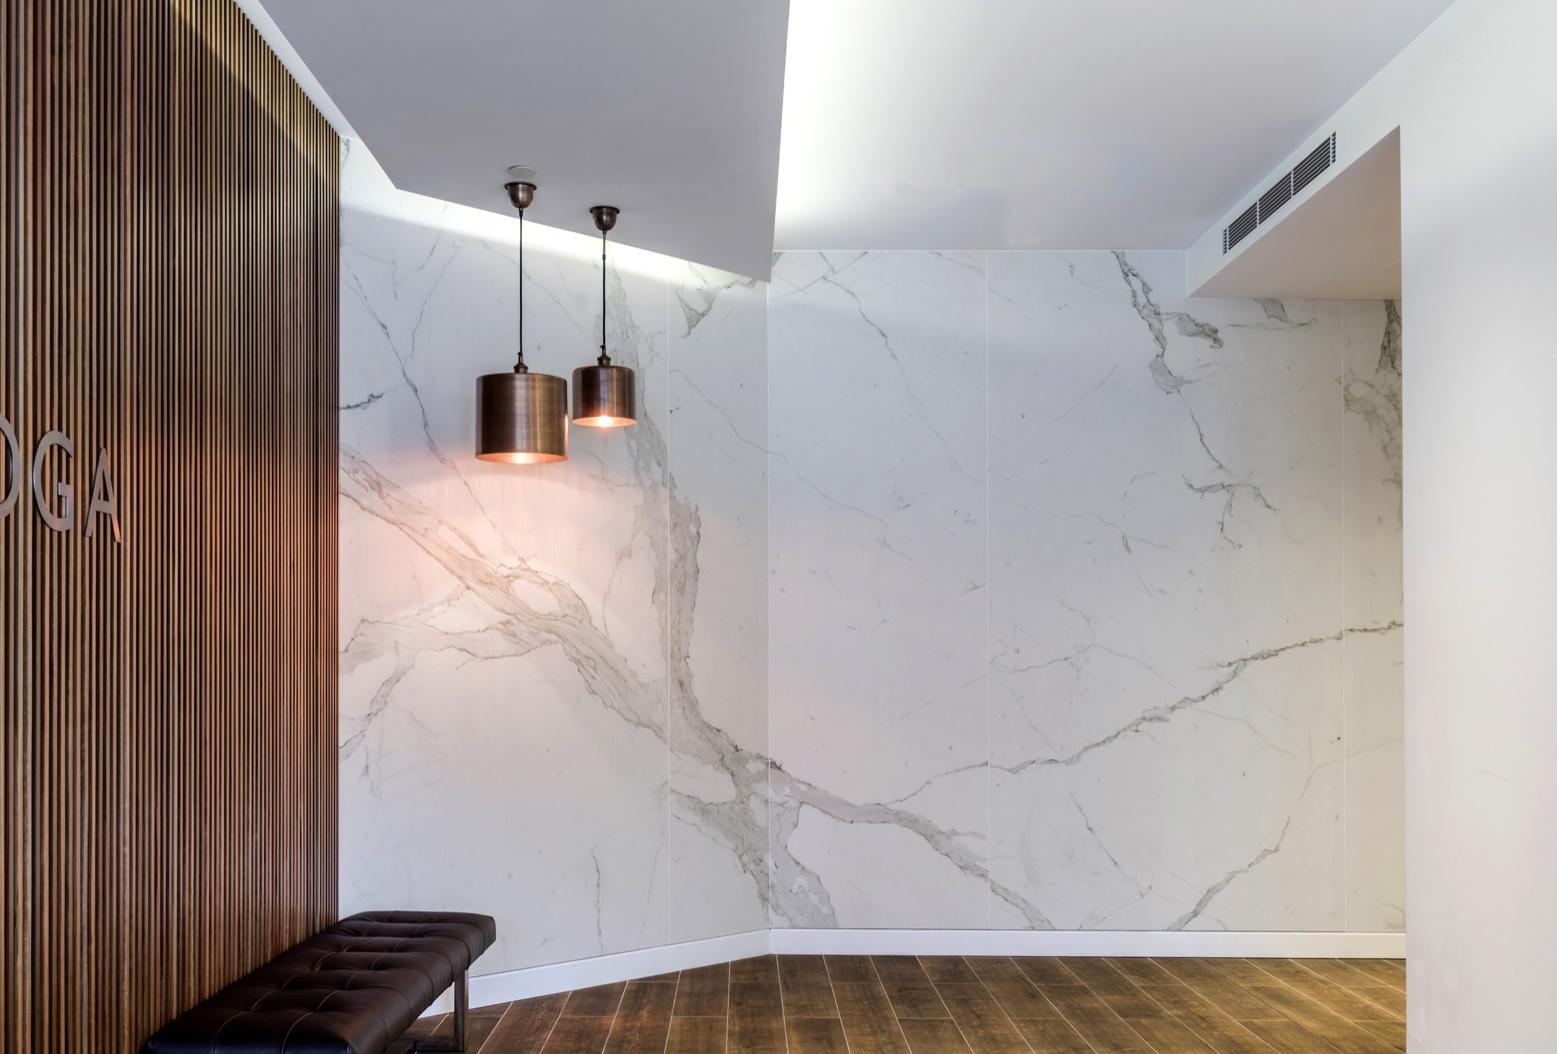 Lighting Basement Washroom Stairs: MAXIMUM Calacatta Porcelain Panels By Artedomus